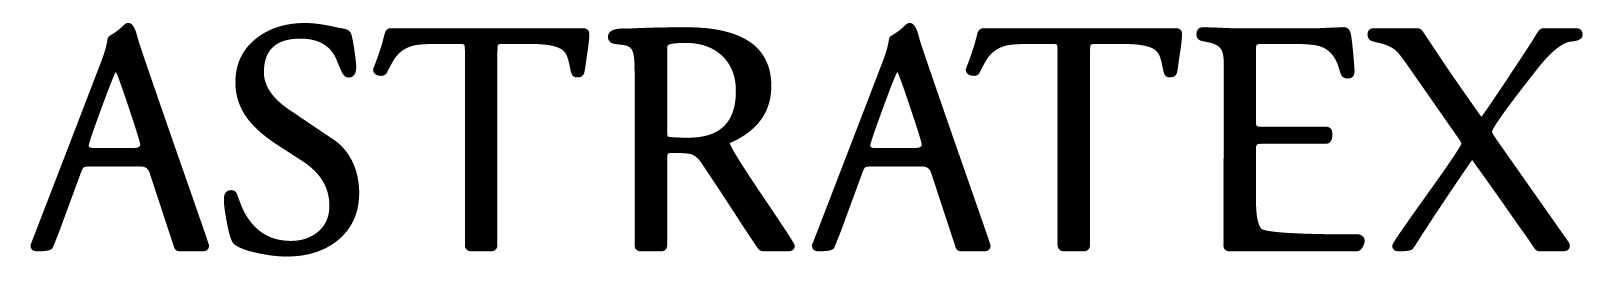 Logo_Astratex_cb